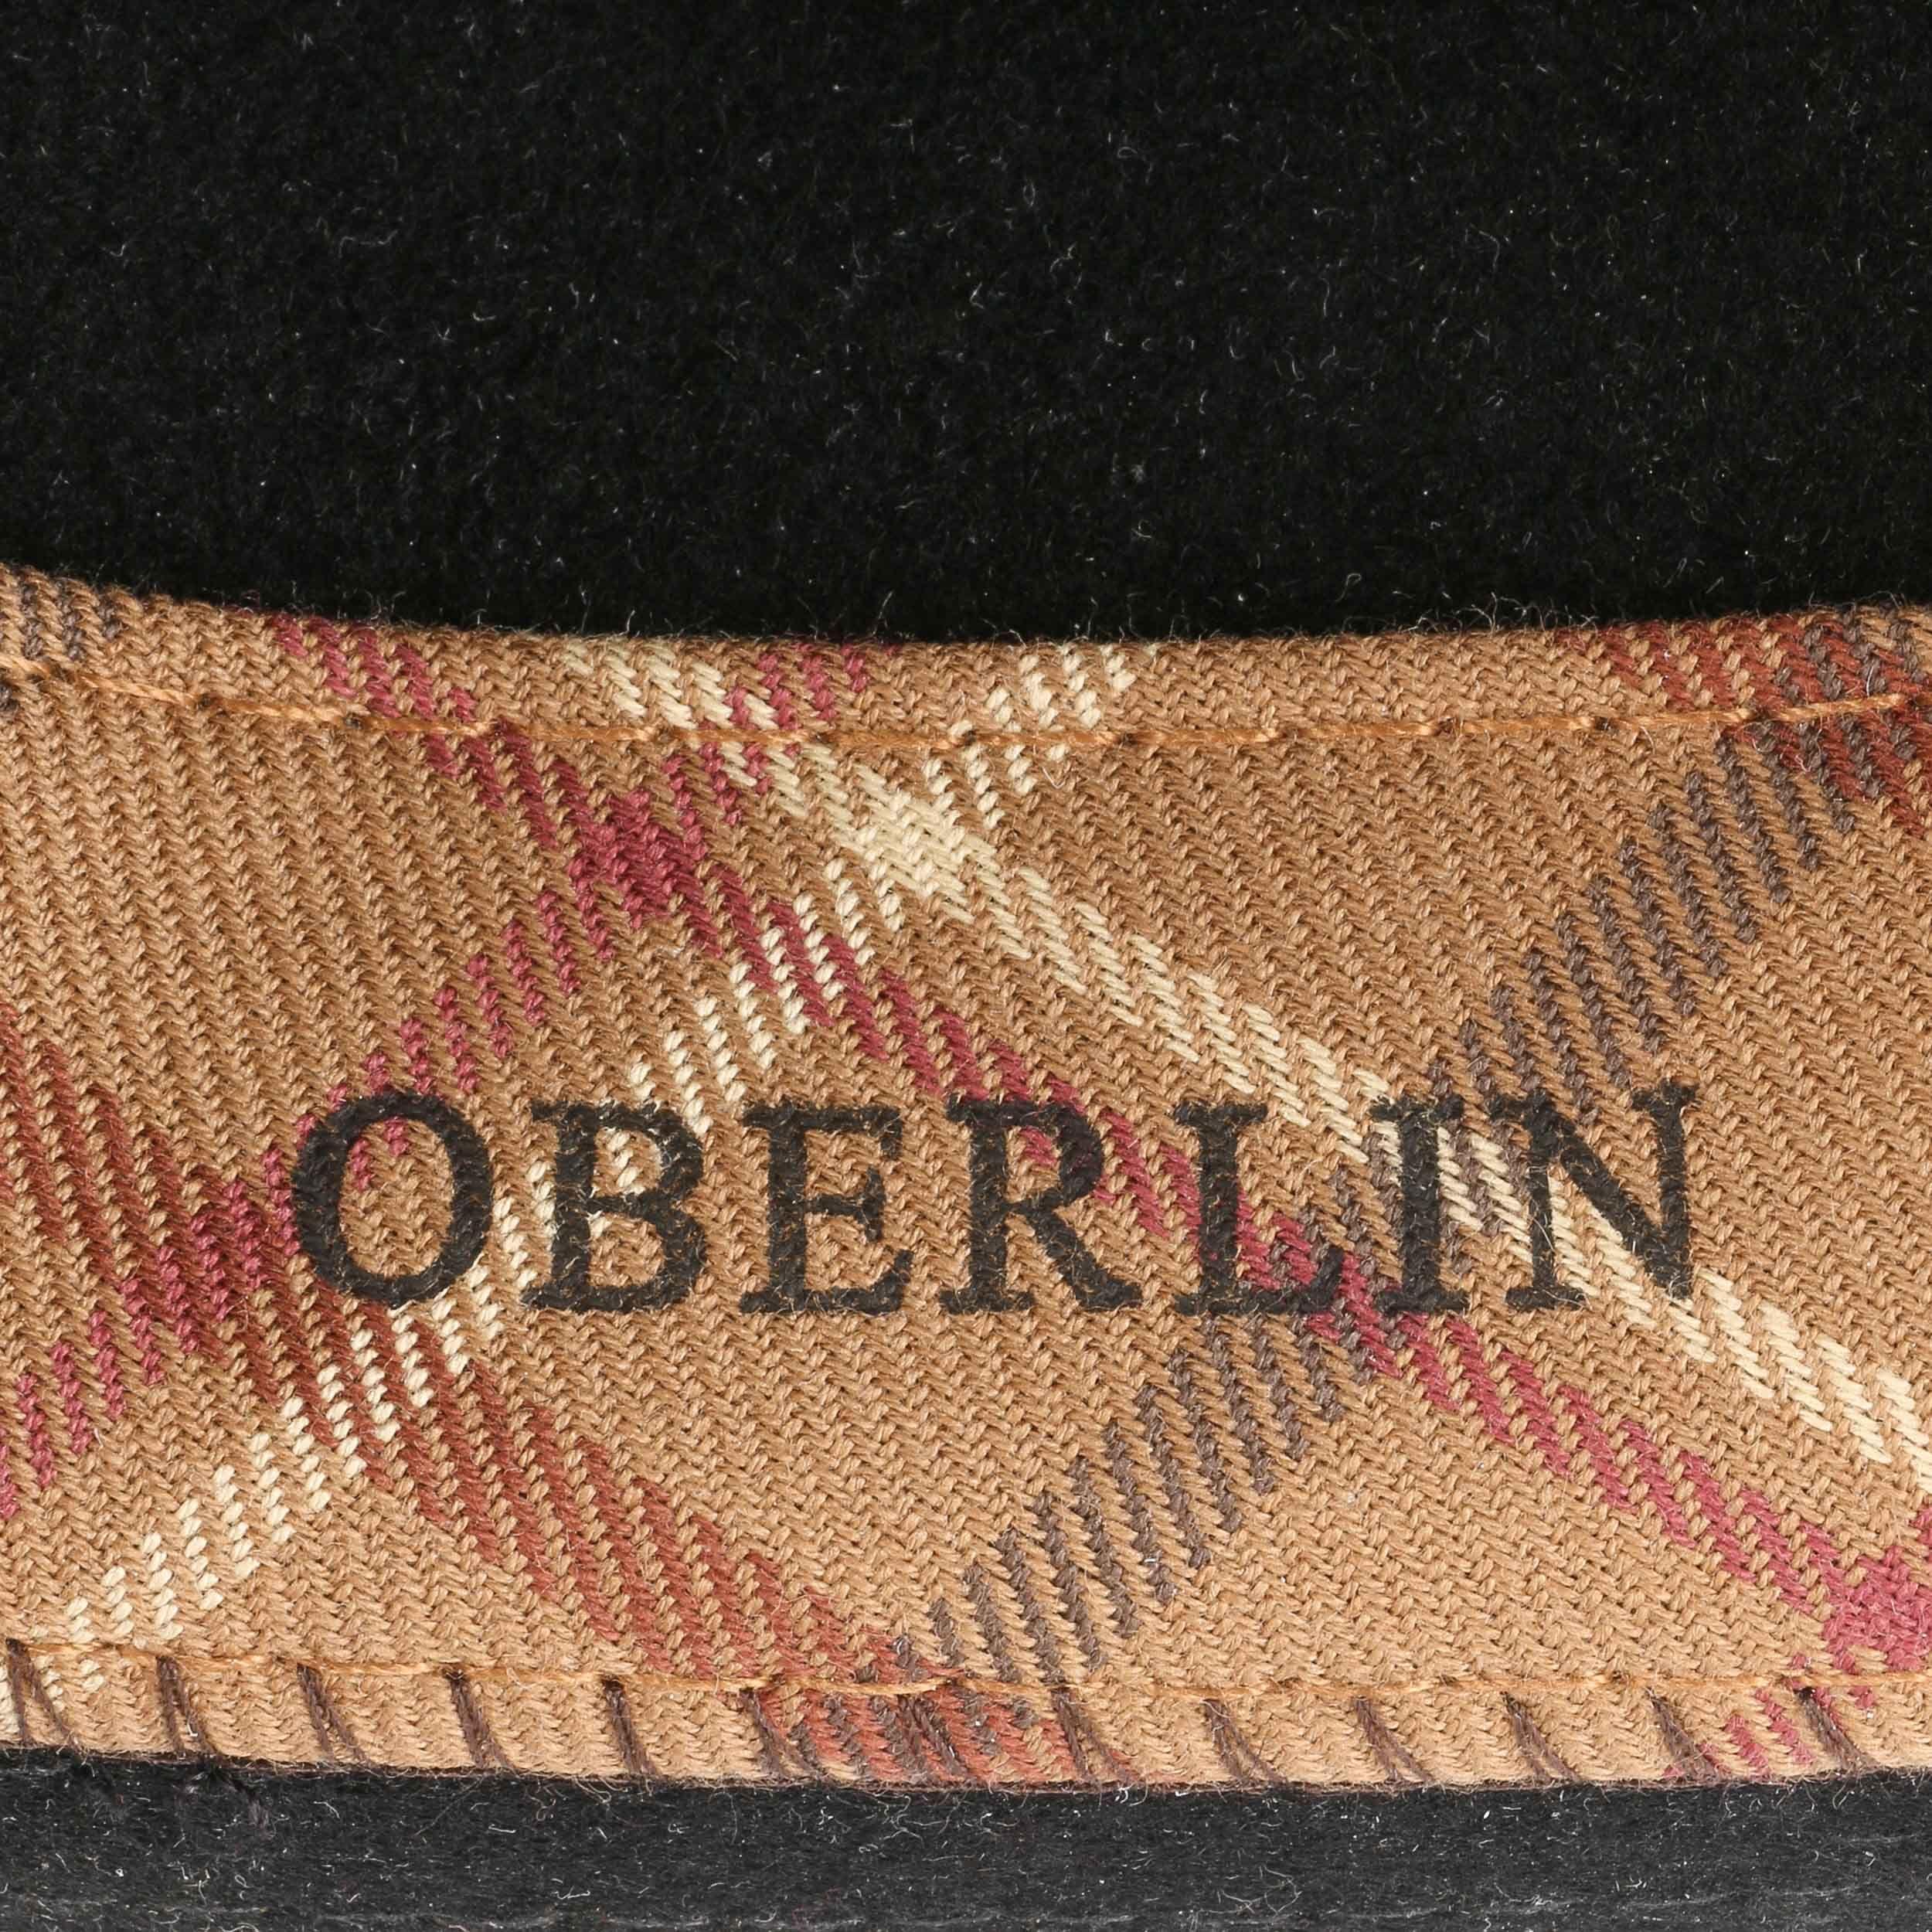 Oberlin VitaFelt Wollfilzhut schwarz